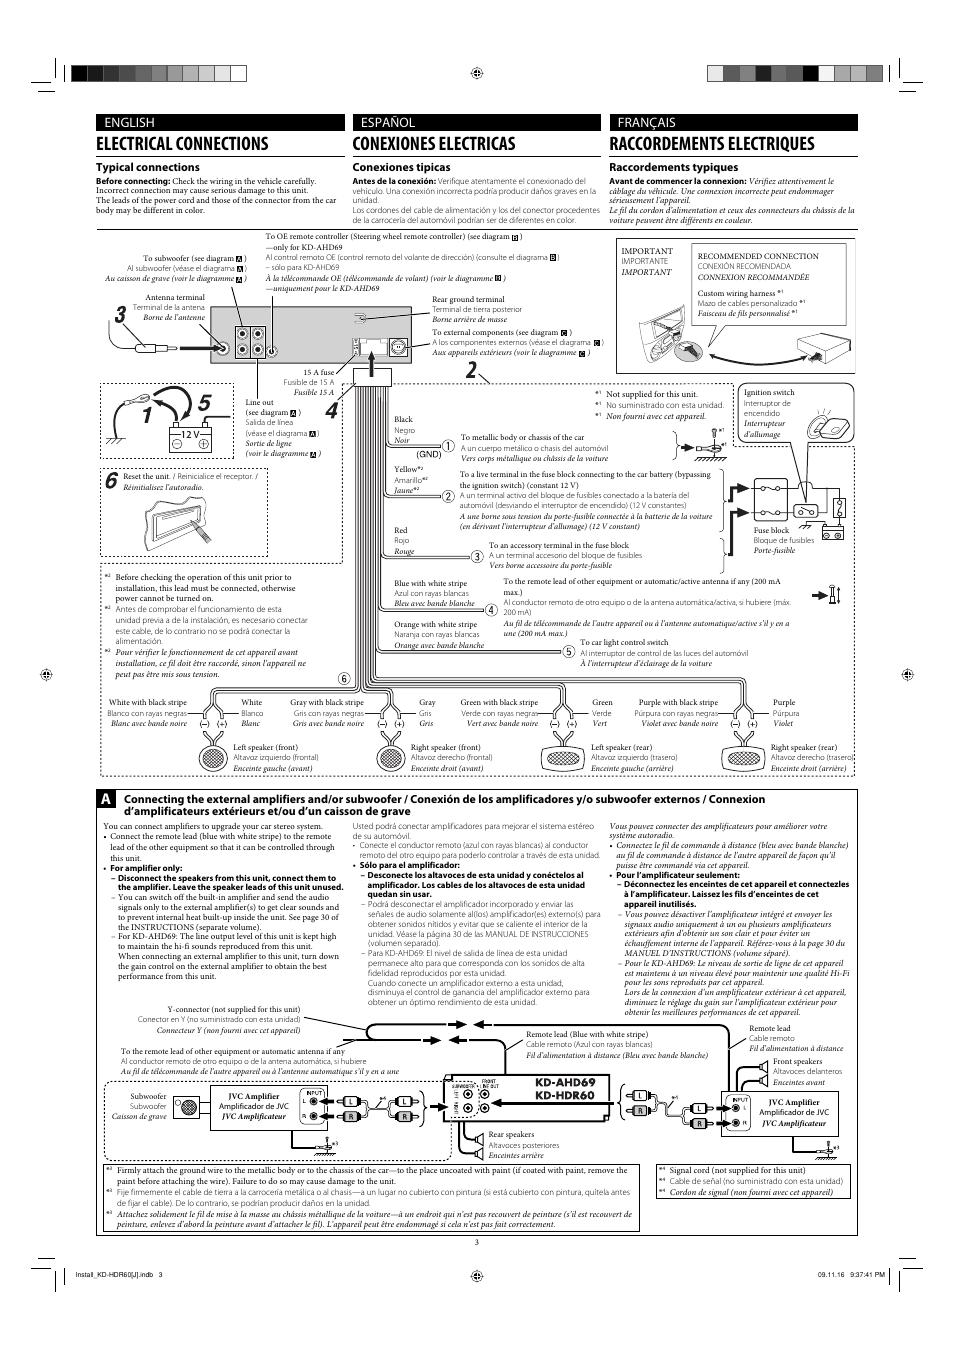 jvc kd ahd69 page3?resize\\=665%2C941 diagrams 683769 jvc kw av60bt wiring diagram 00 civic need help jvc kw-nt3hdt wiring diagram at gsmx.co